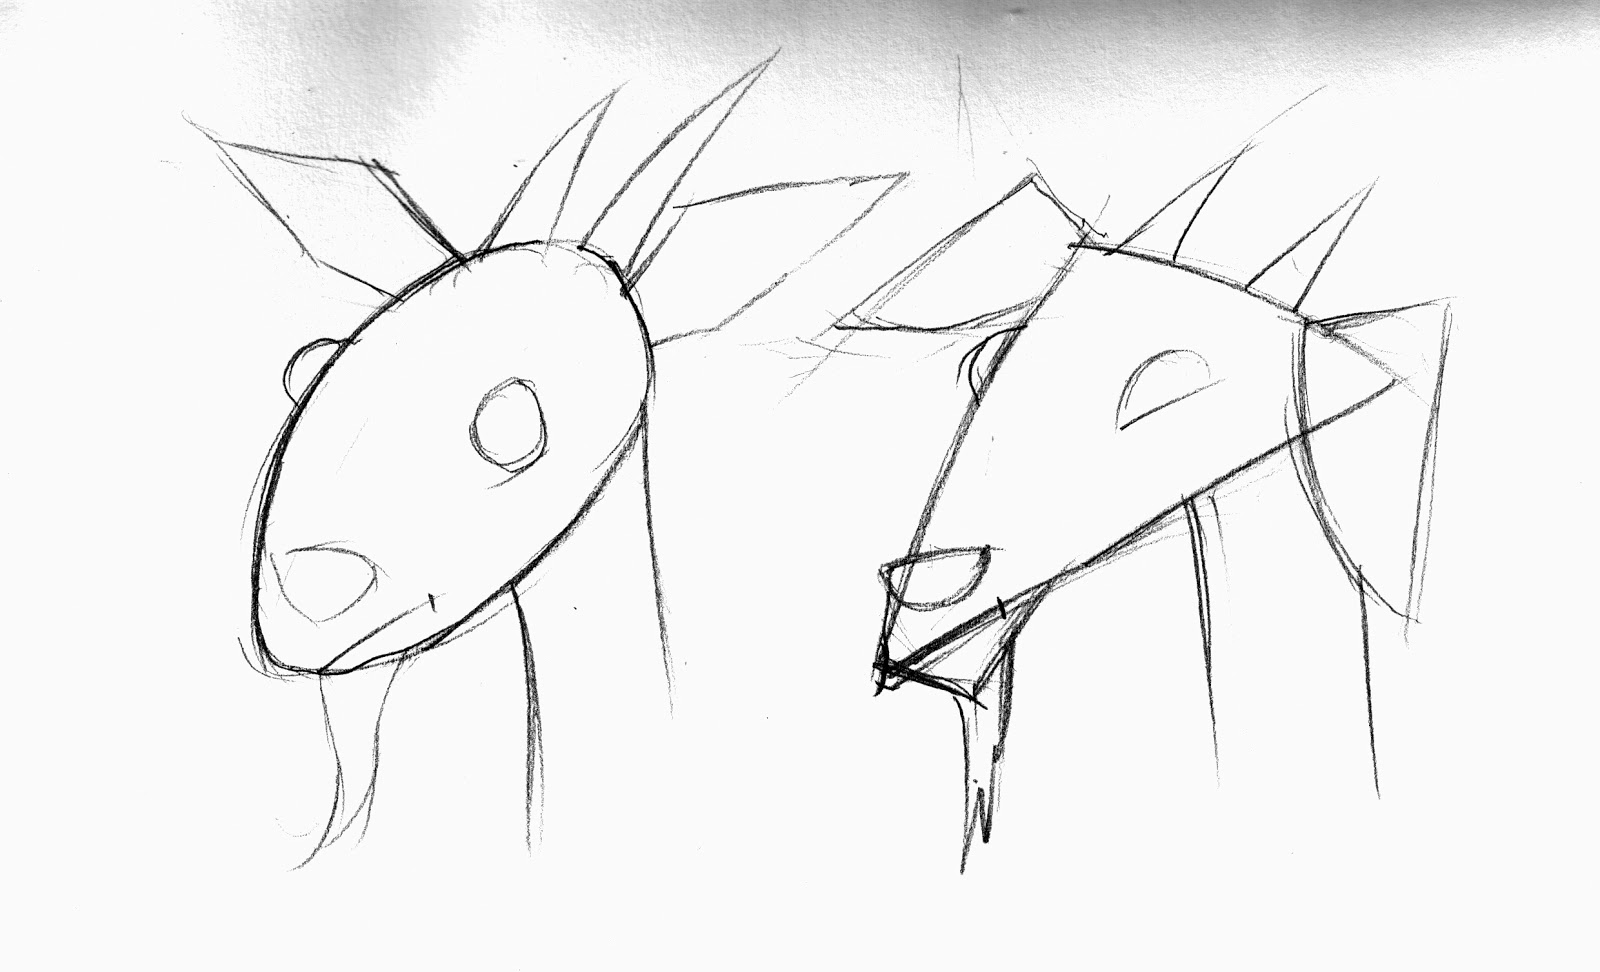 1600x972 Brett Helquist How To Draw A Grumpy Goat Part 2